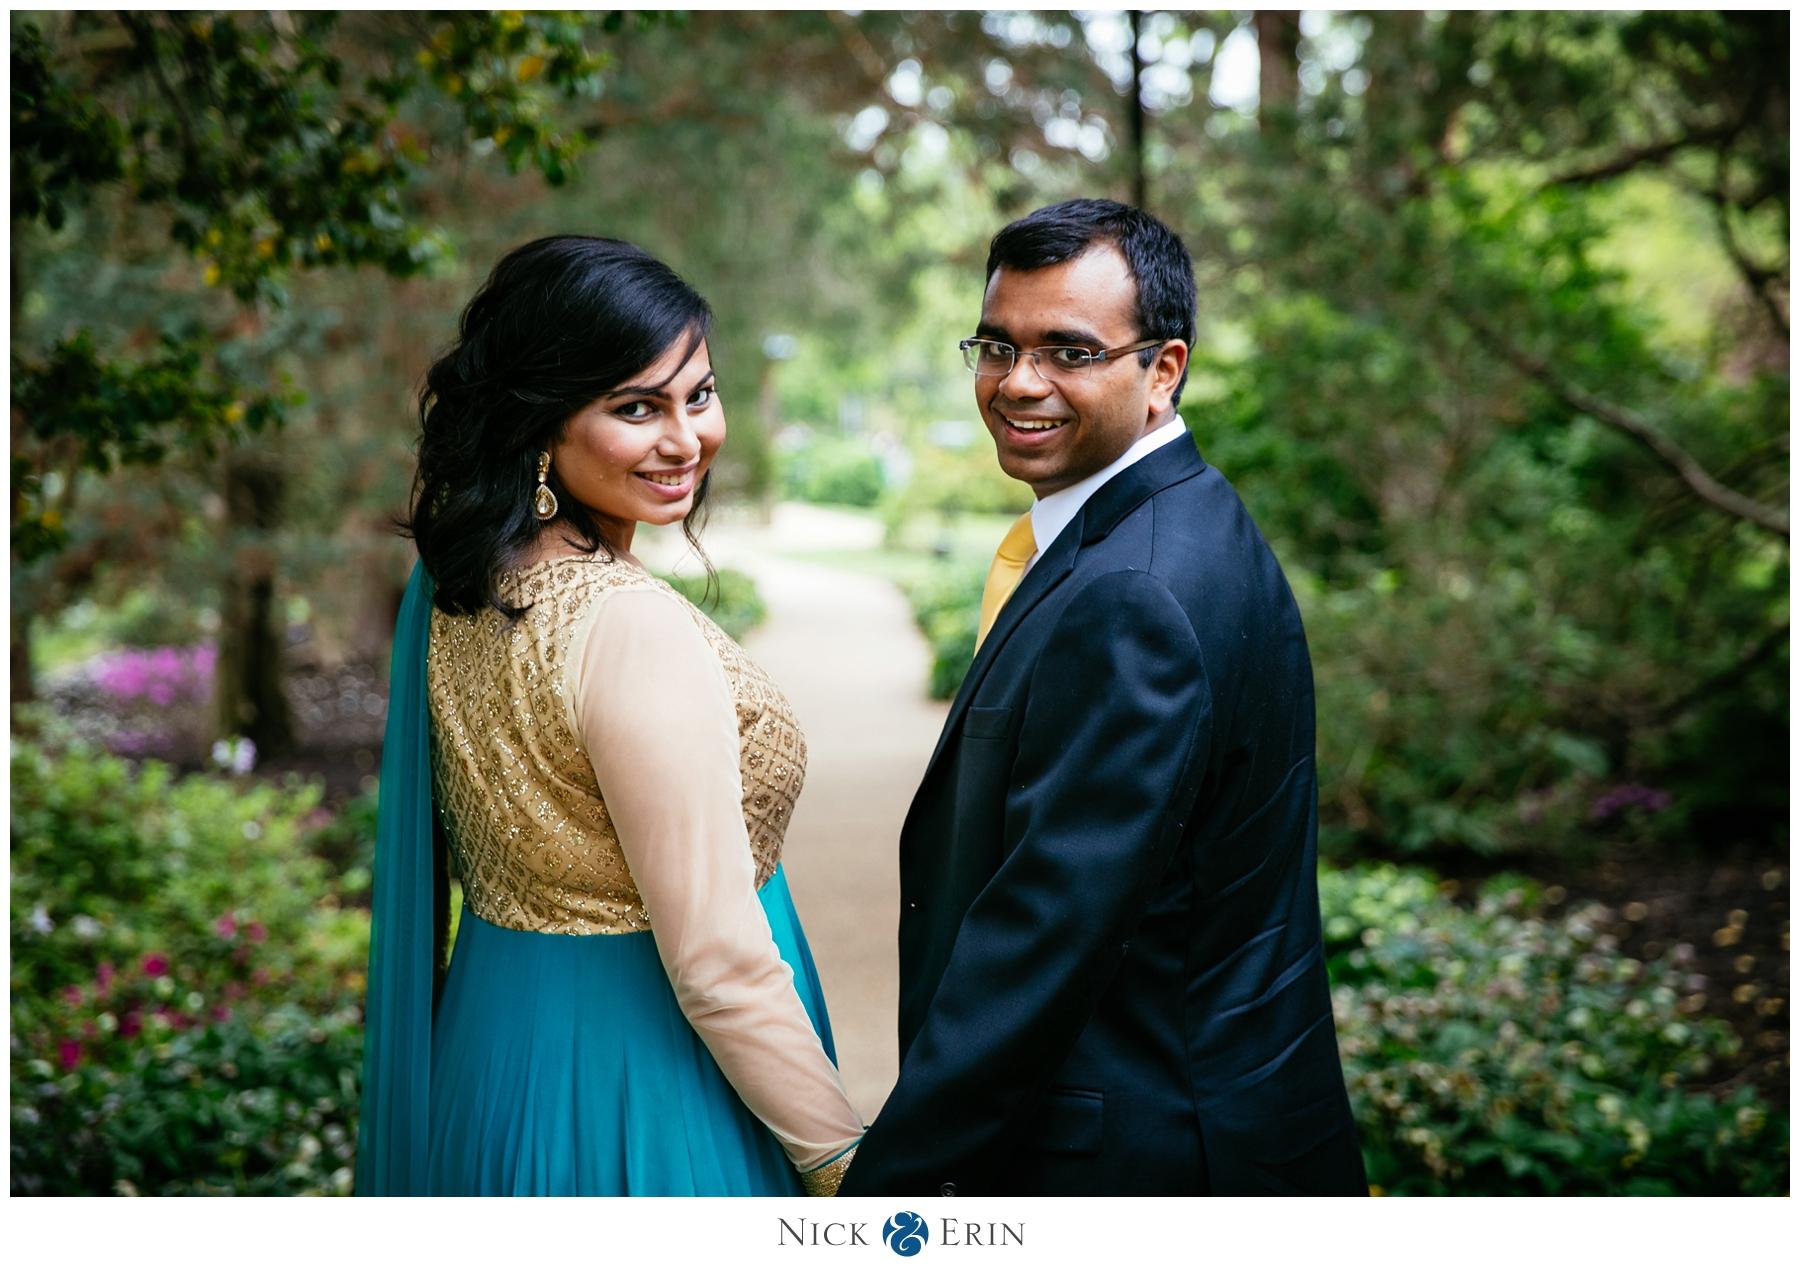 Donner_Photography_Arlington VA Wedding_Amrith and Aleefia_0004